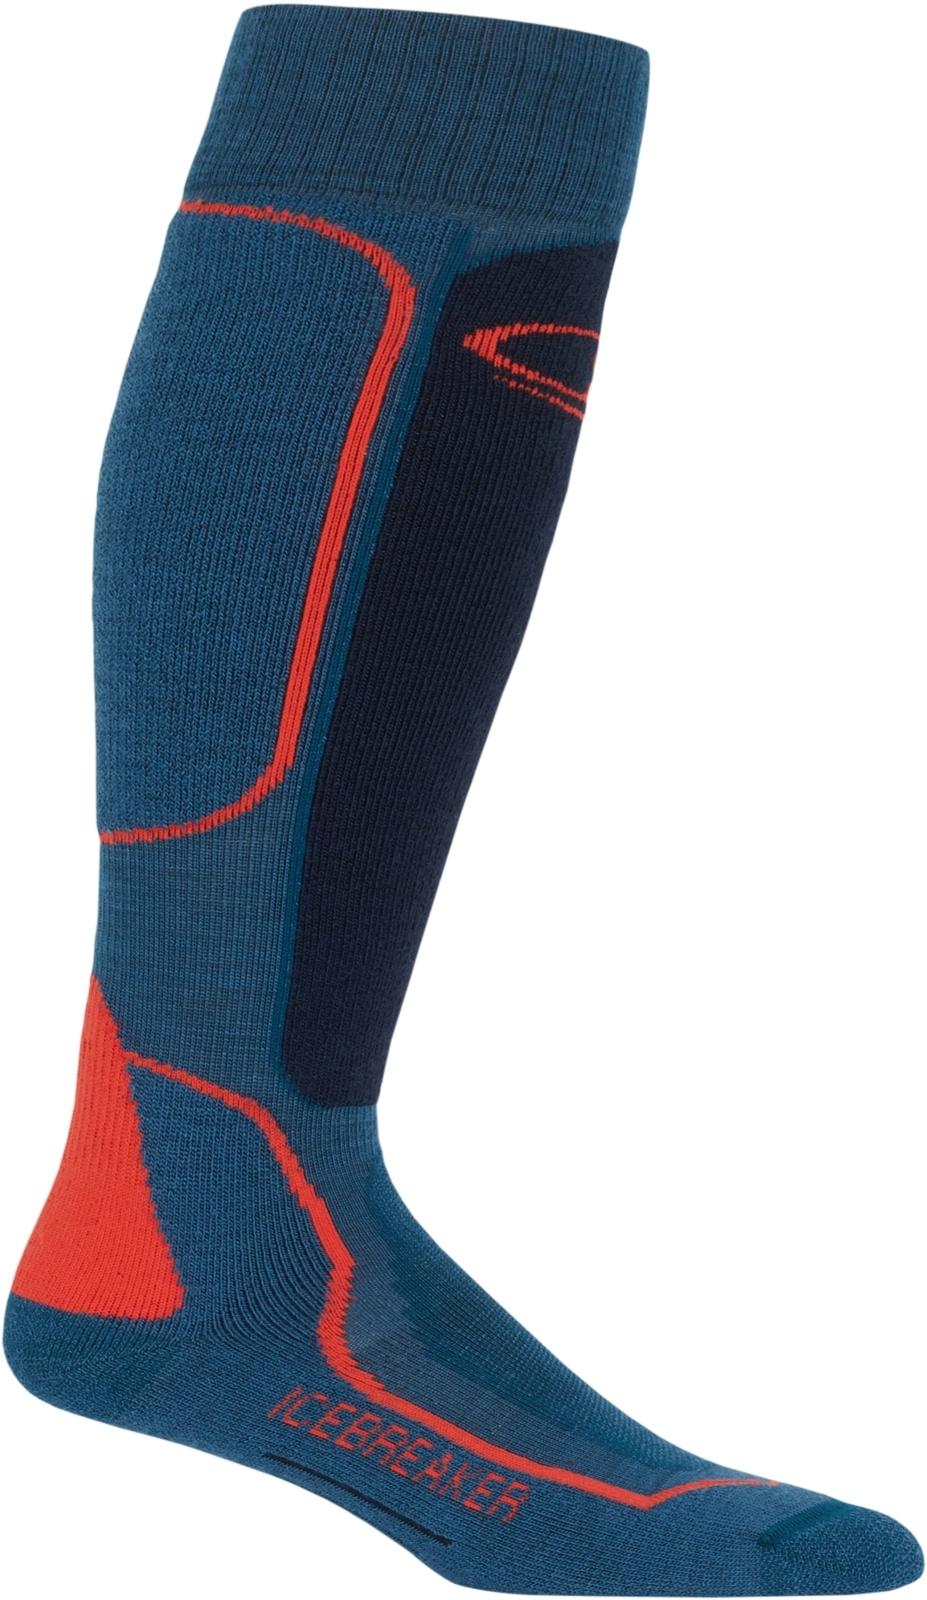 Pánské lyžařské ponožky Icebreaker Mens Ski+ Medium OTC - prussian  blue midnight navy chili red c62ec1c435